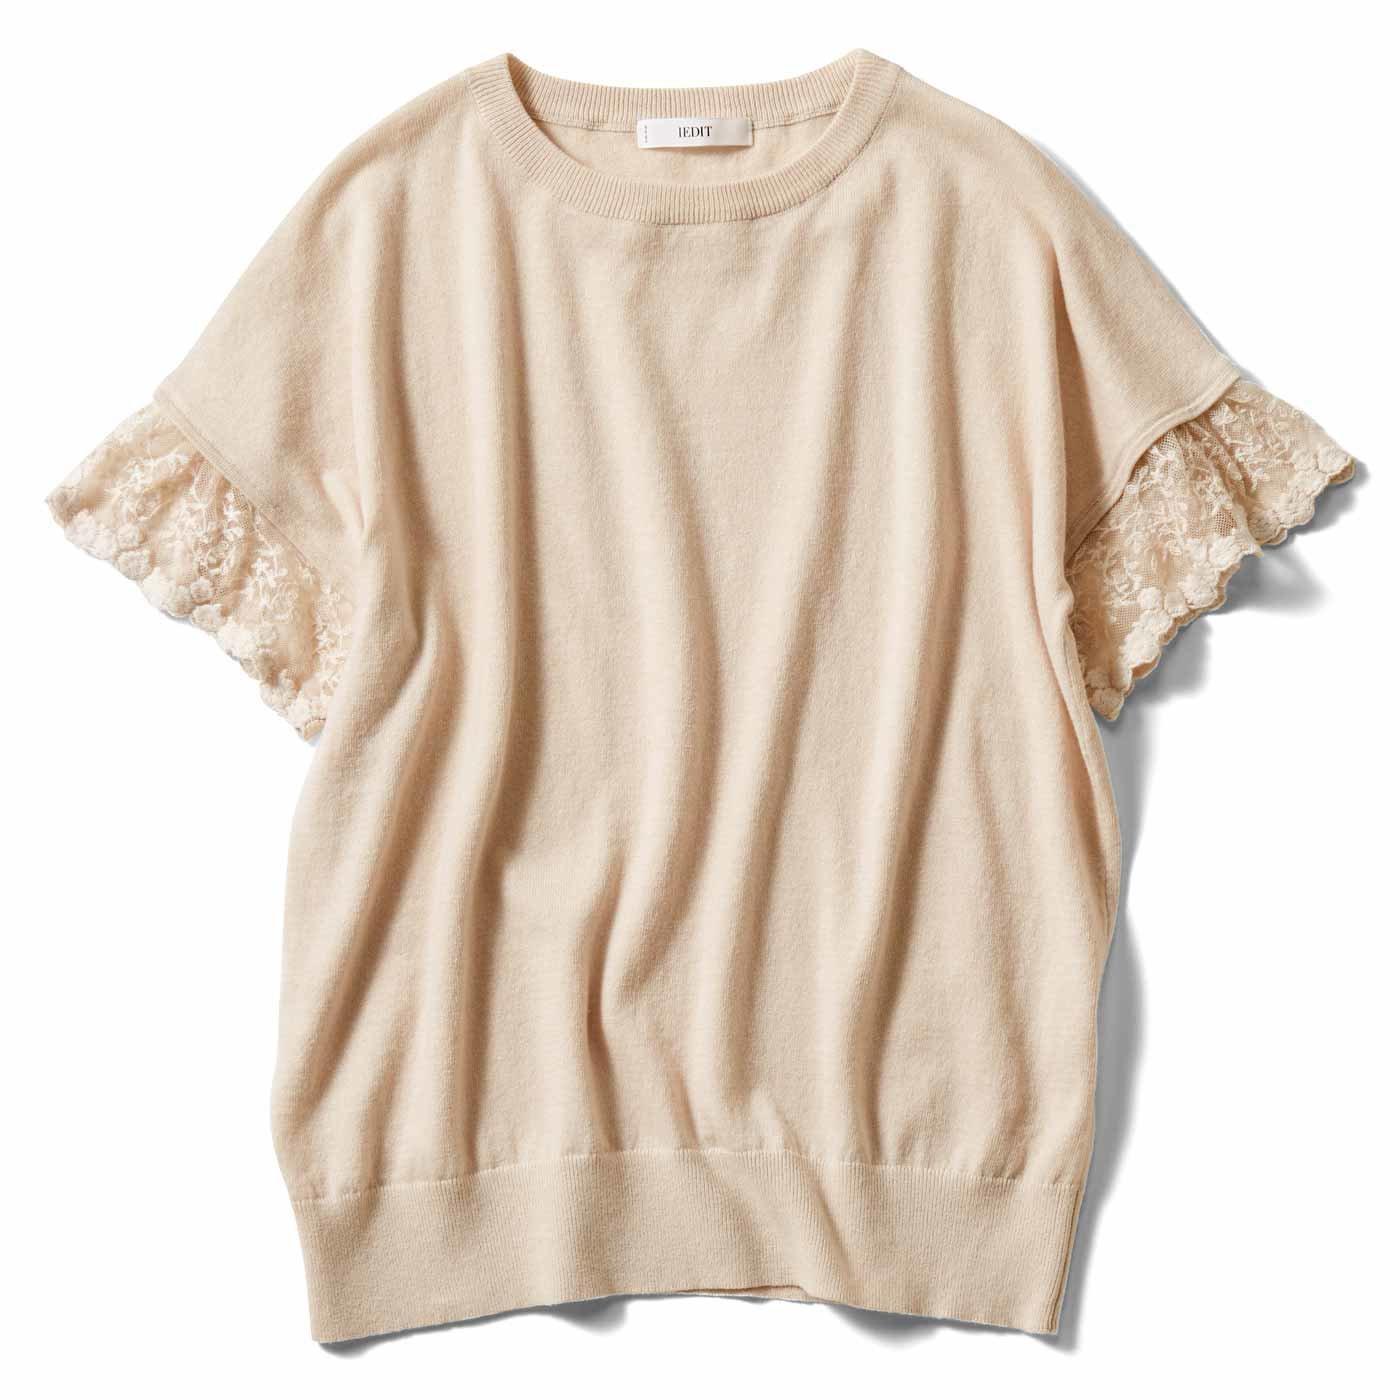 IEDIT[イディット] 綿素材で着心地快適 着映え袖レースニット〈ベージュ〉